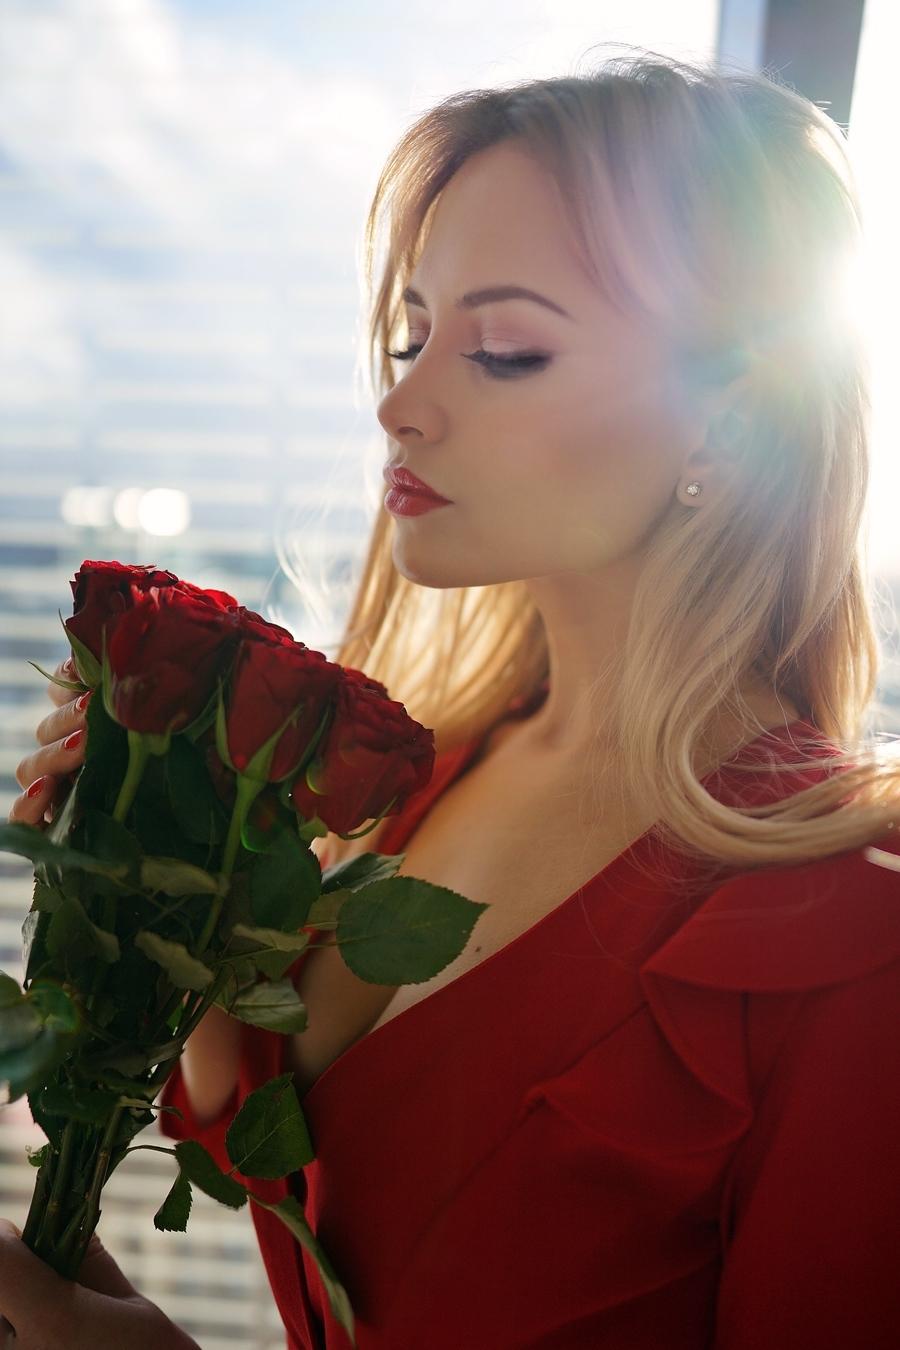 feminine  / Model Katie Royle / Uploaded 28th August 2021 @ 08:16 PM